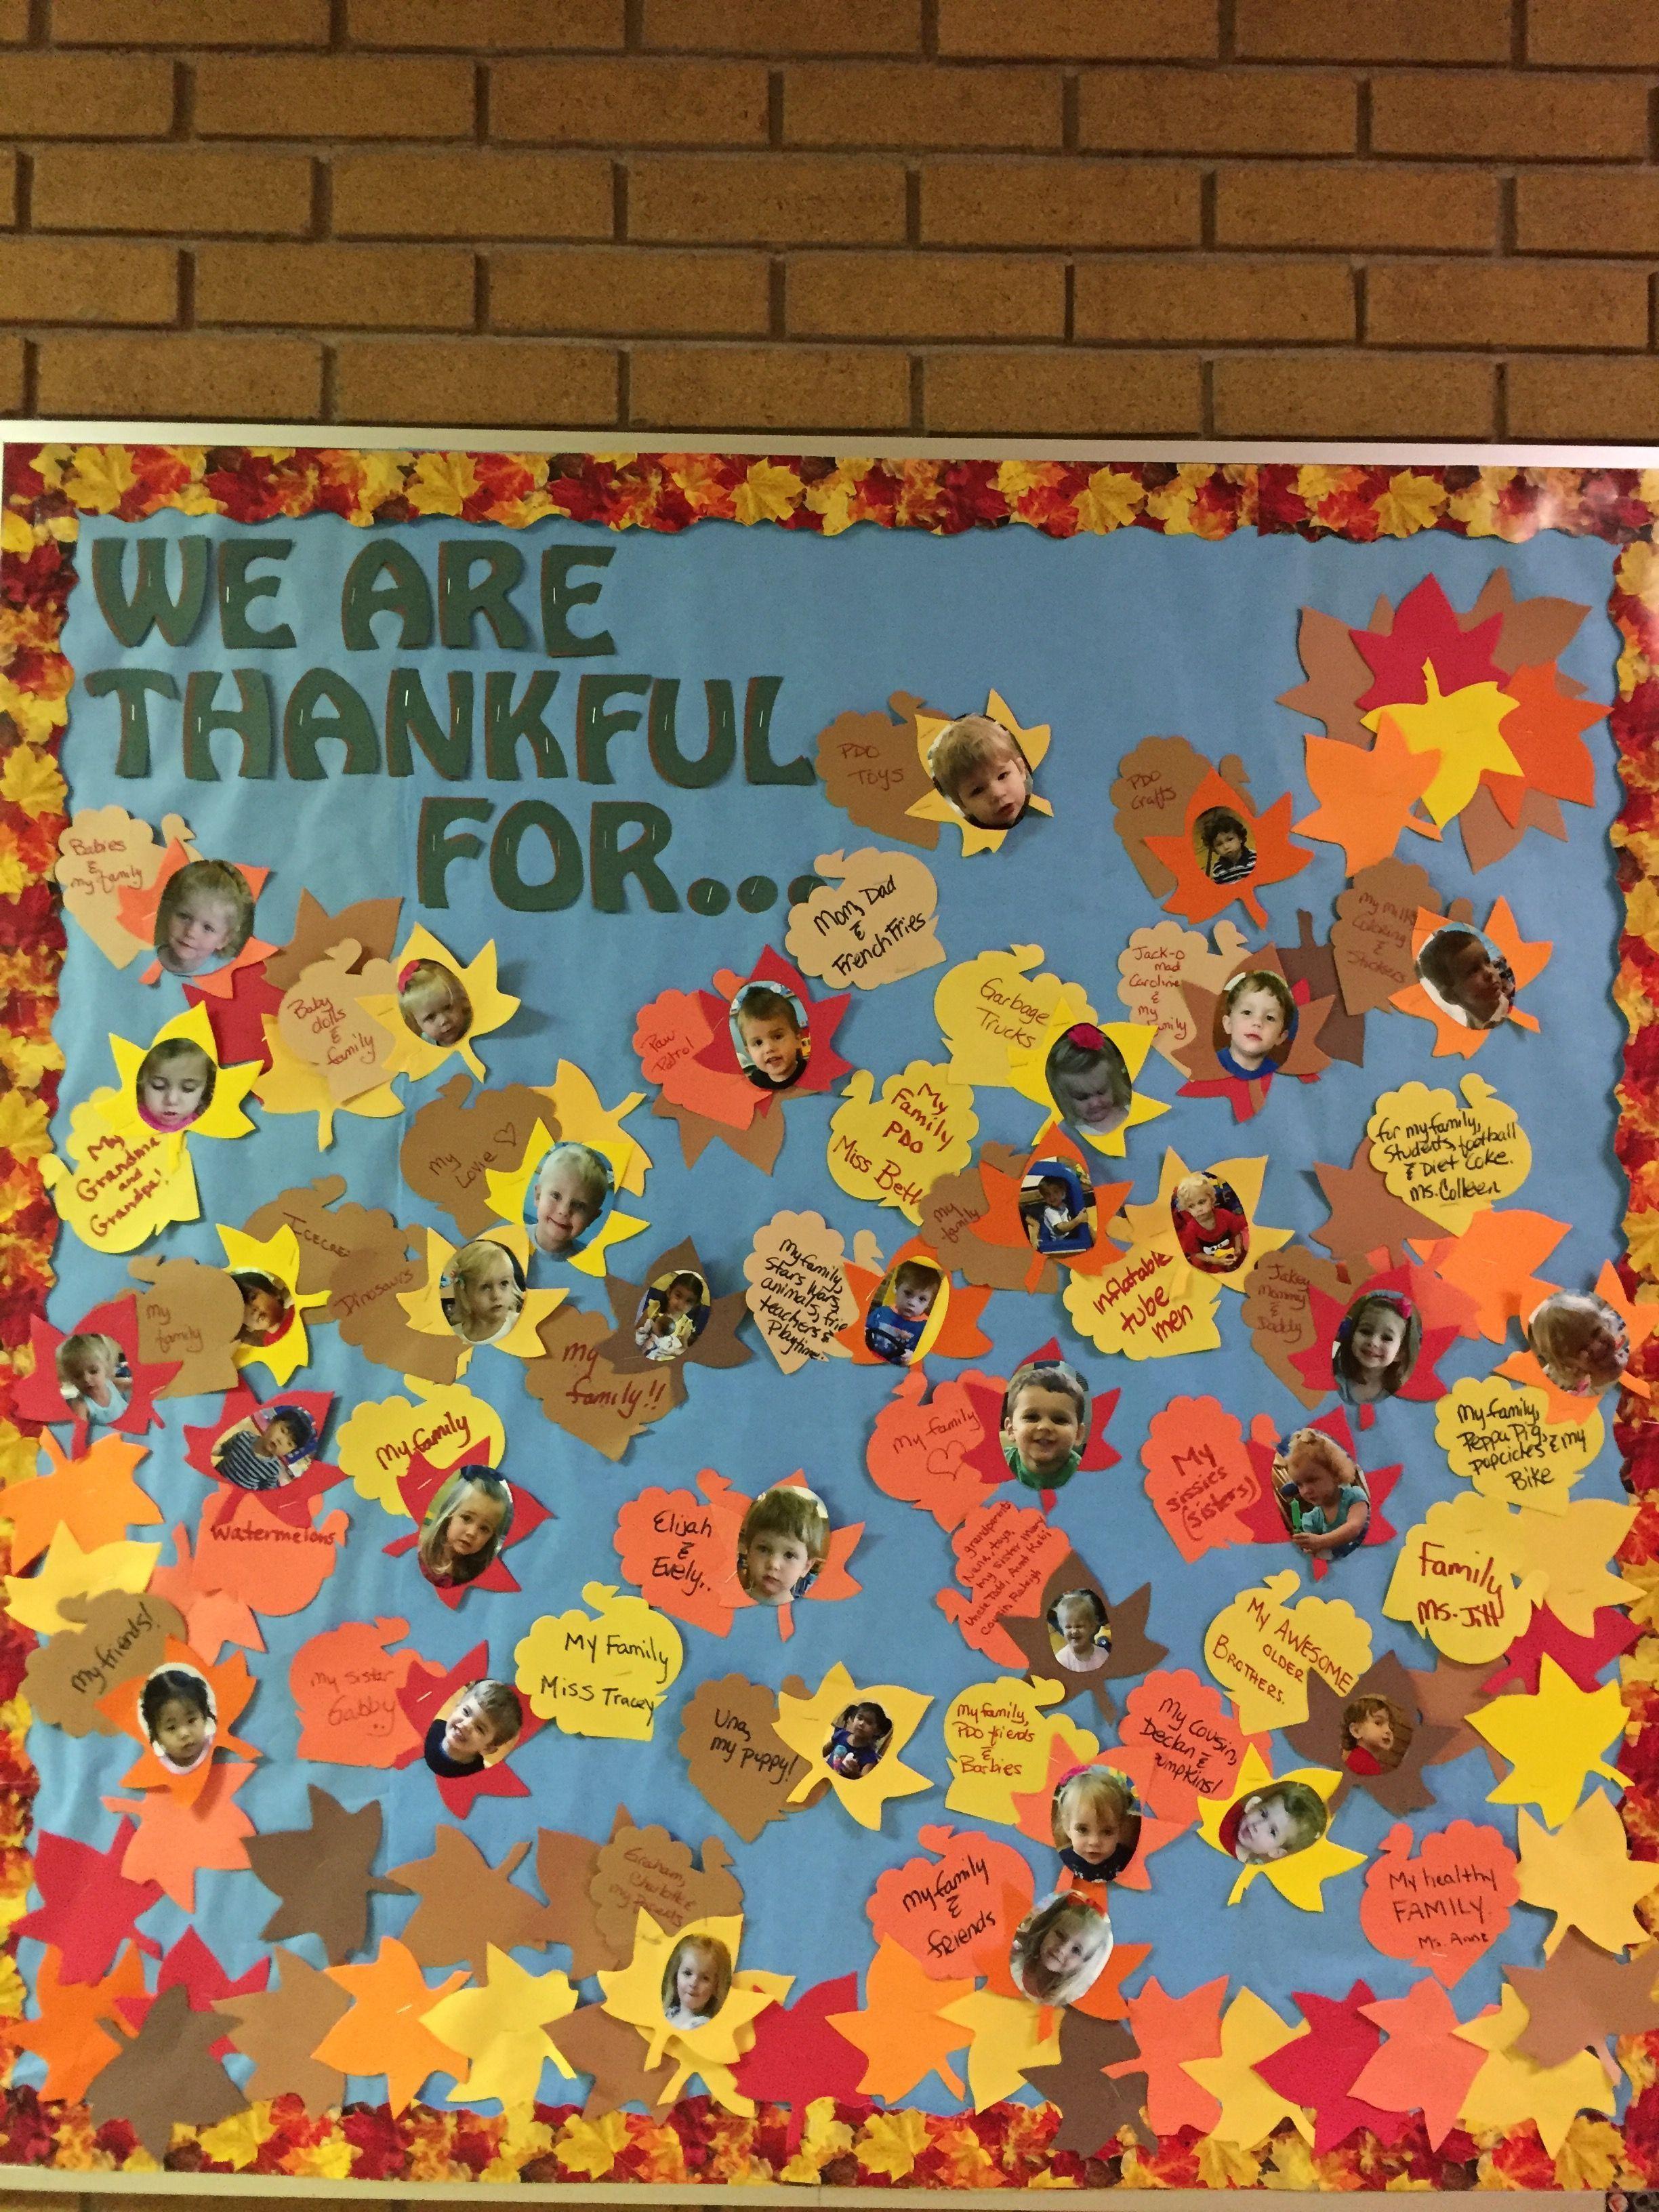 November bulletin board: we are thankful..& each child's response. #novemberbulletinboards November bulletin board: we are thankful..& each child's response. #novemberbulletinboards November bulletin board: we are thankful..& each child's response. #novemberbulletinboards November bulletin board: we are thankful..& each child's response.